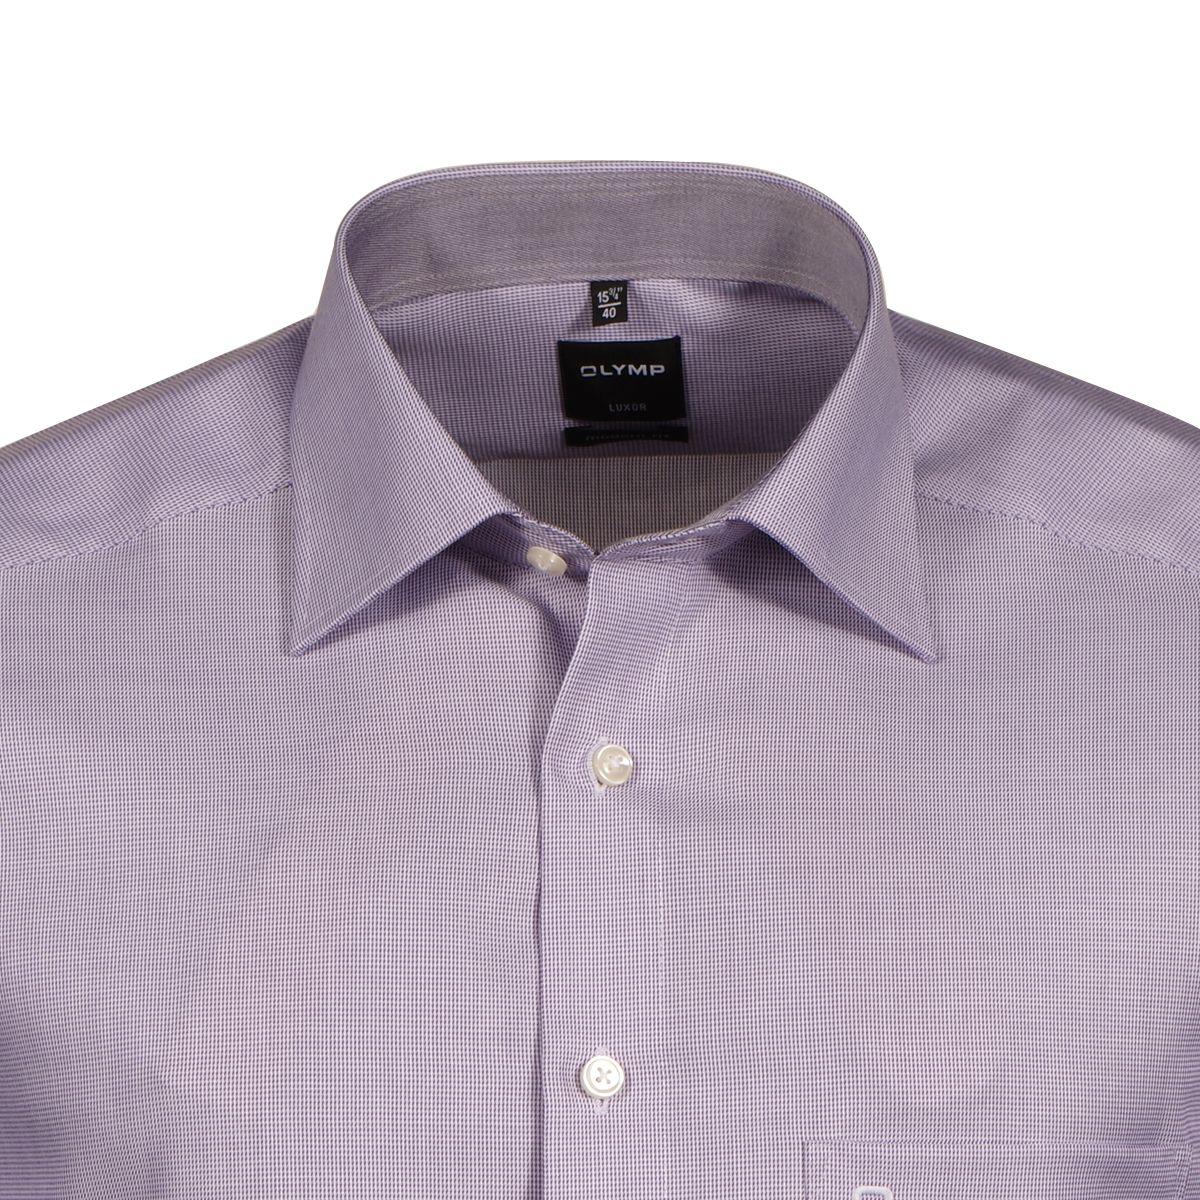 chemise violette fantaisie blanche semi cintr e manches extra longues 69cm size factory olymp. Black Bedroom Furniture Sets. Home Design Ideas